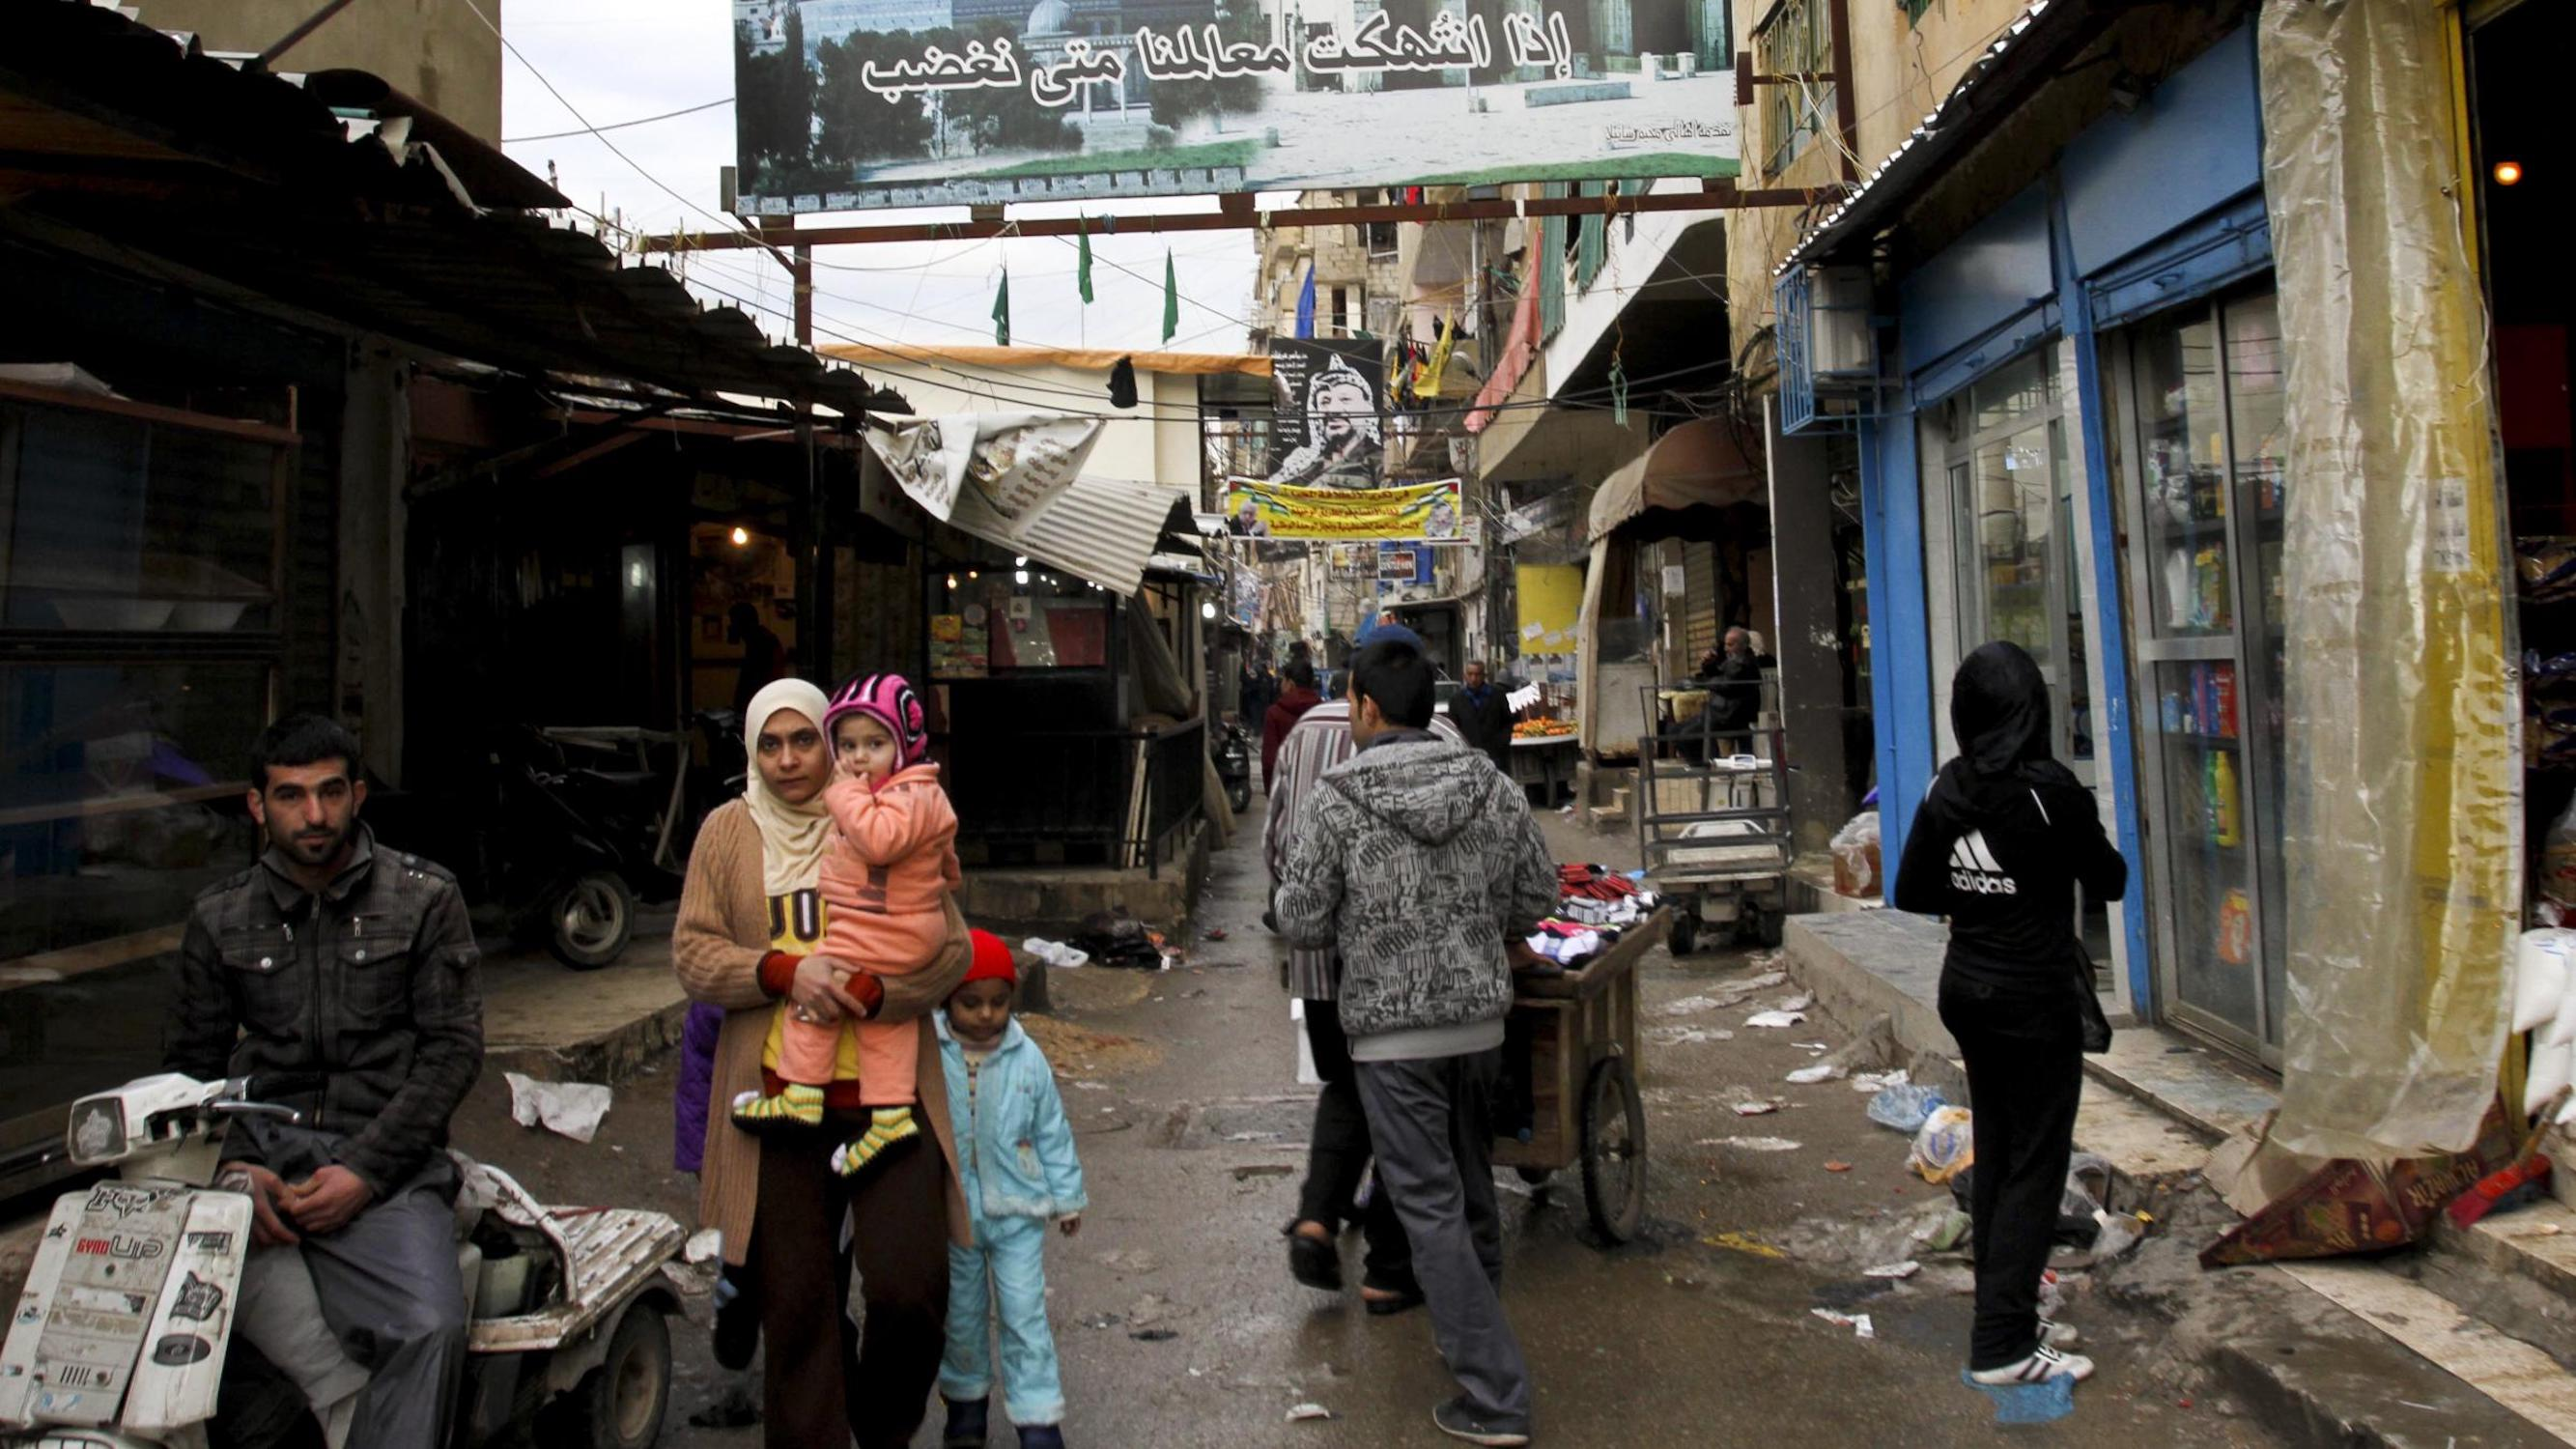 Palestinian refugees in Lebanon.